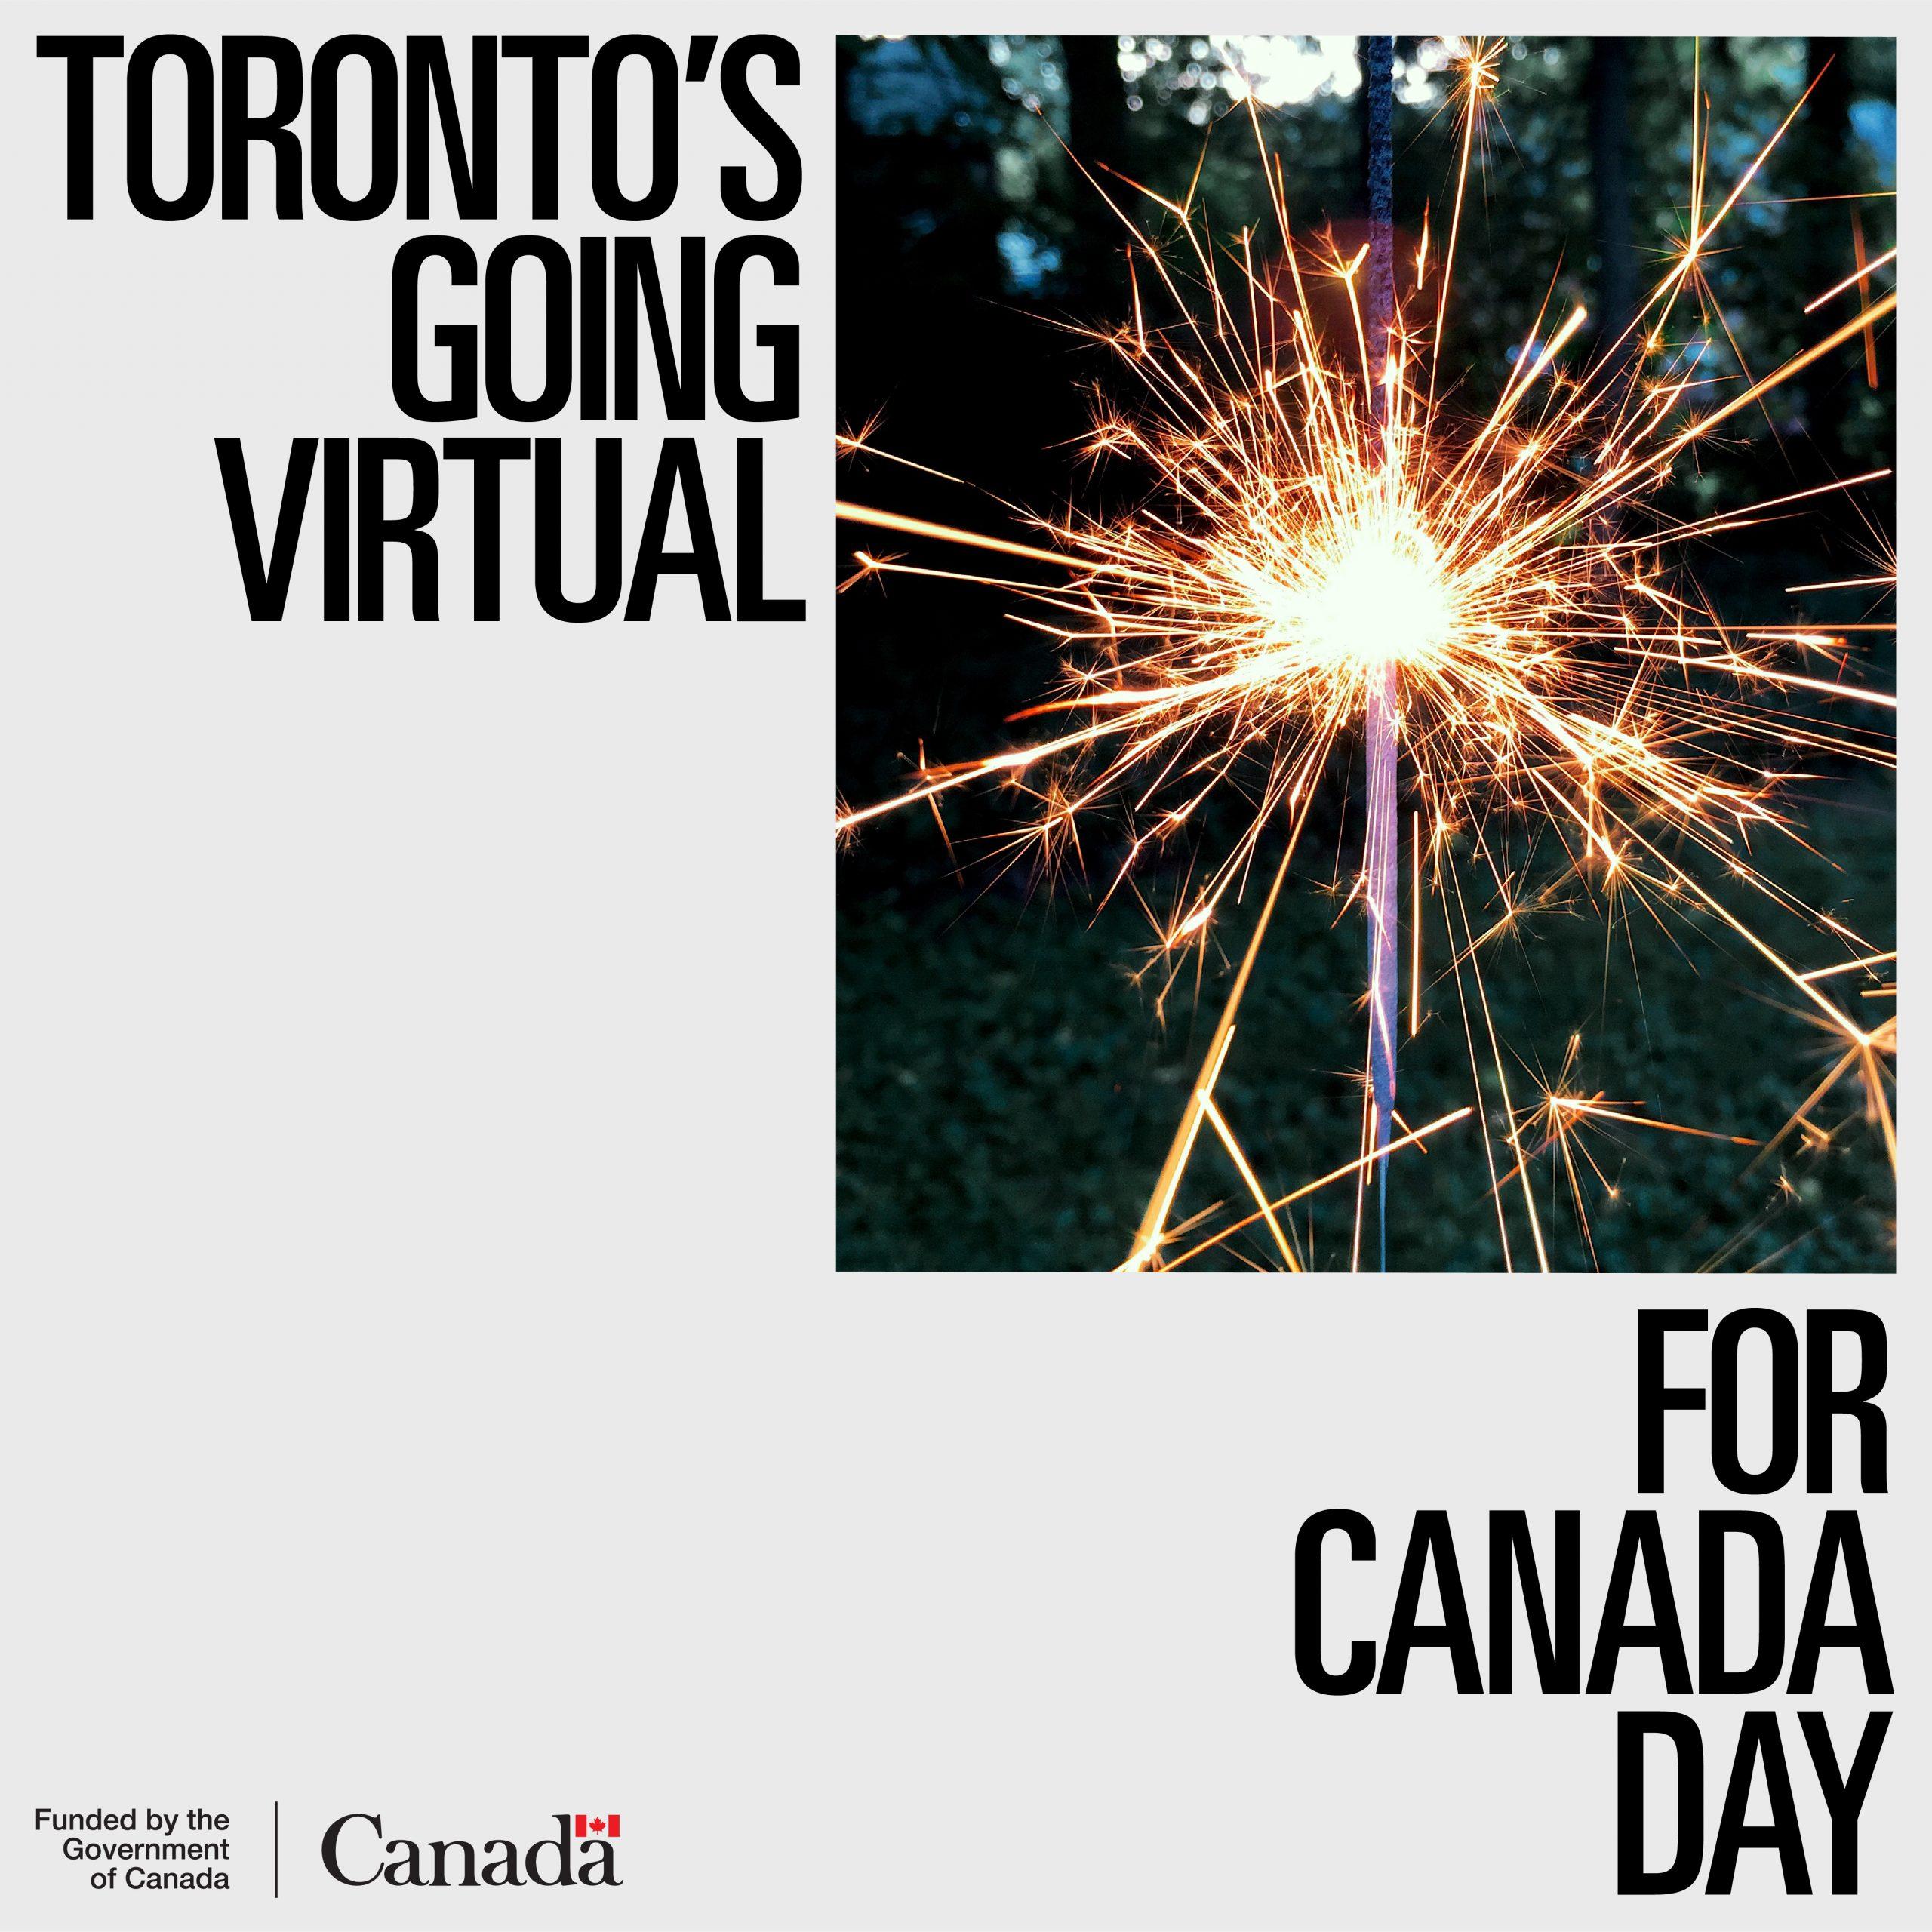 canada day 2020 - photo #8